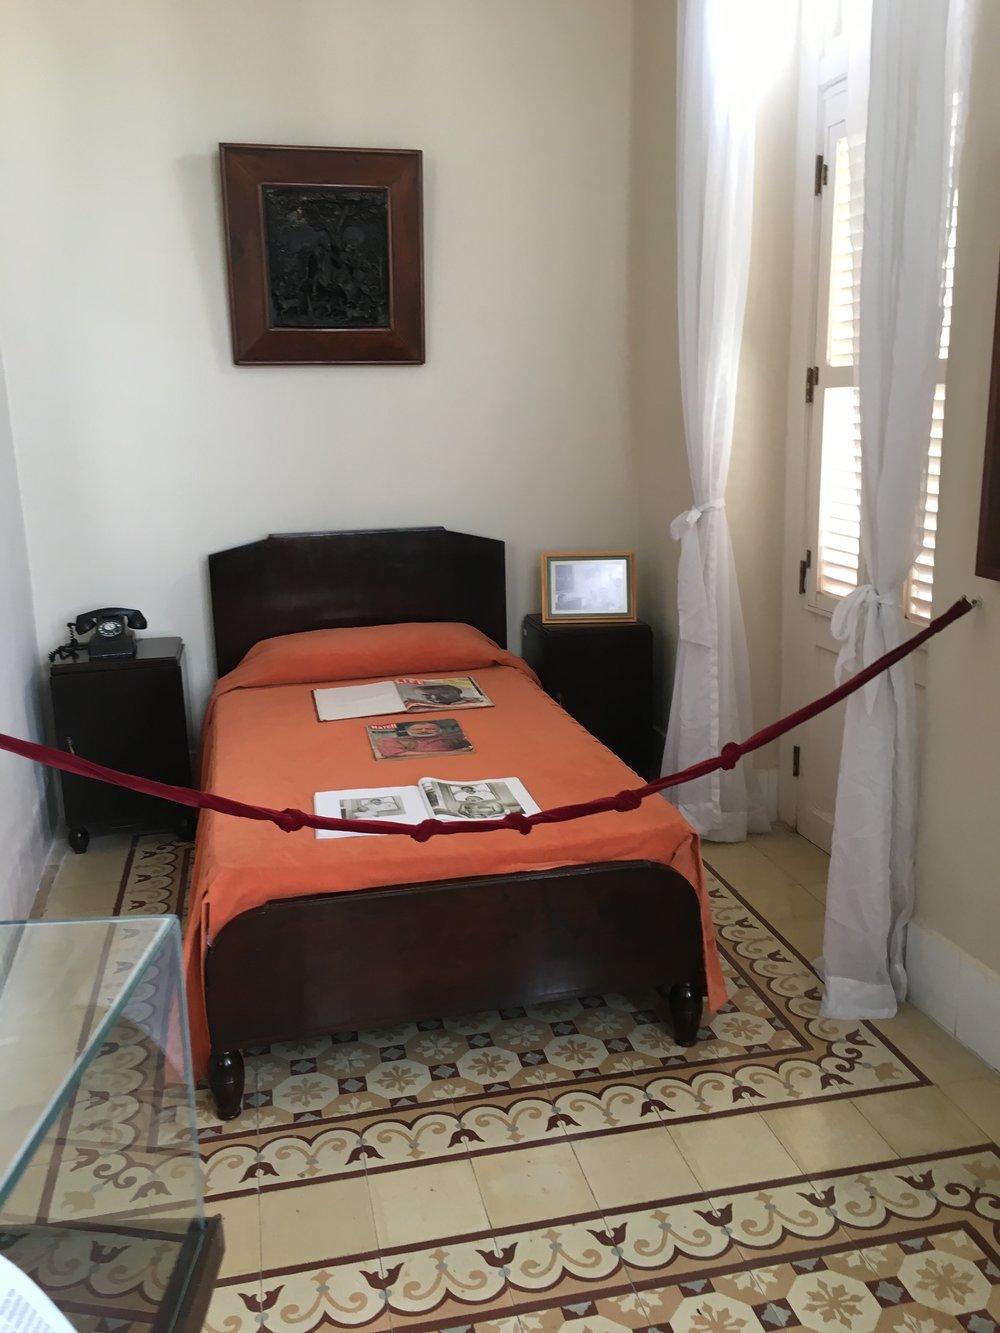 Hemingway's room in Hotel Ambrose